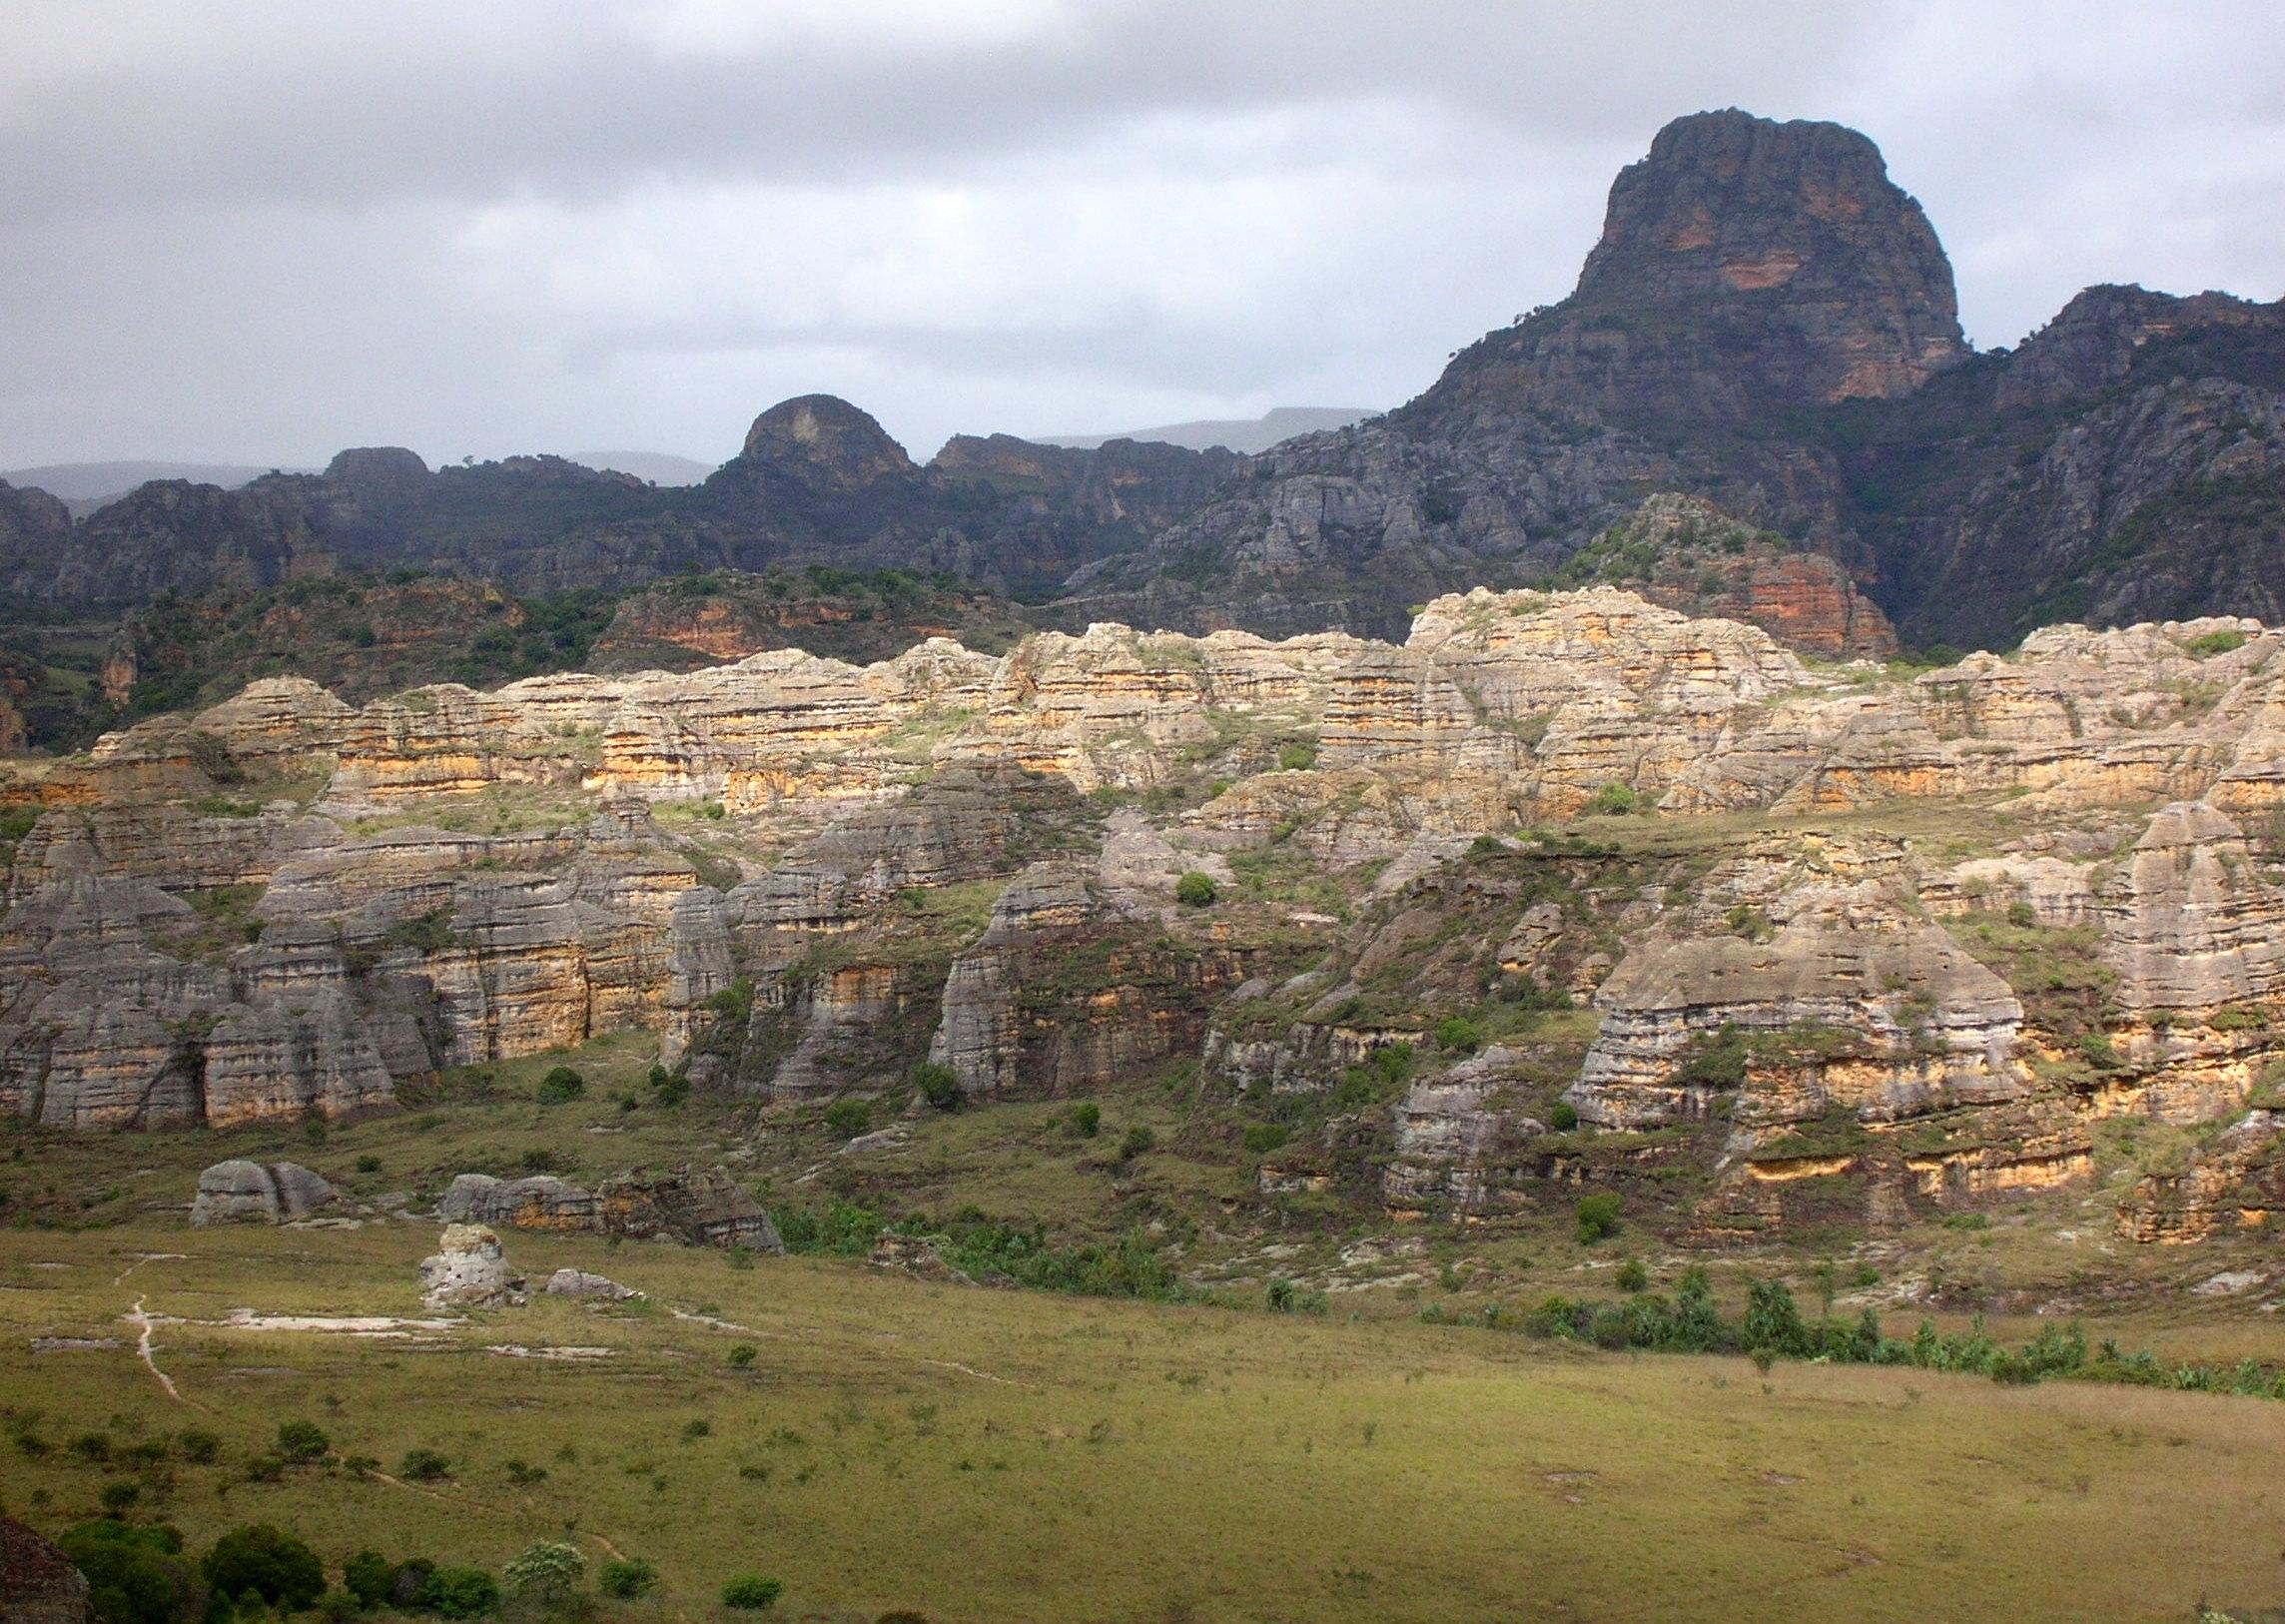 File:Isalo National Park 02.jpg - Wikimedia Commons